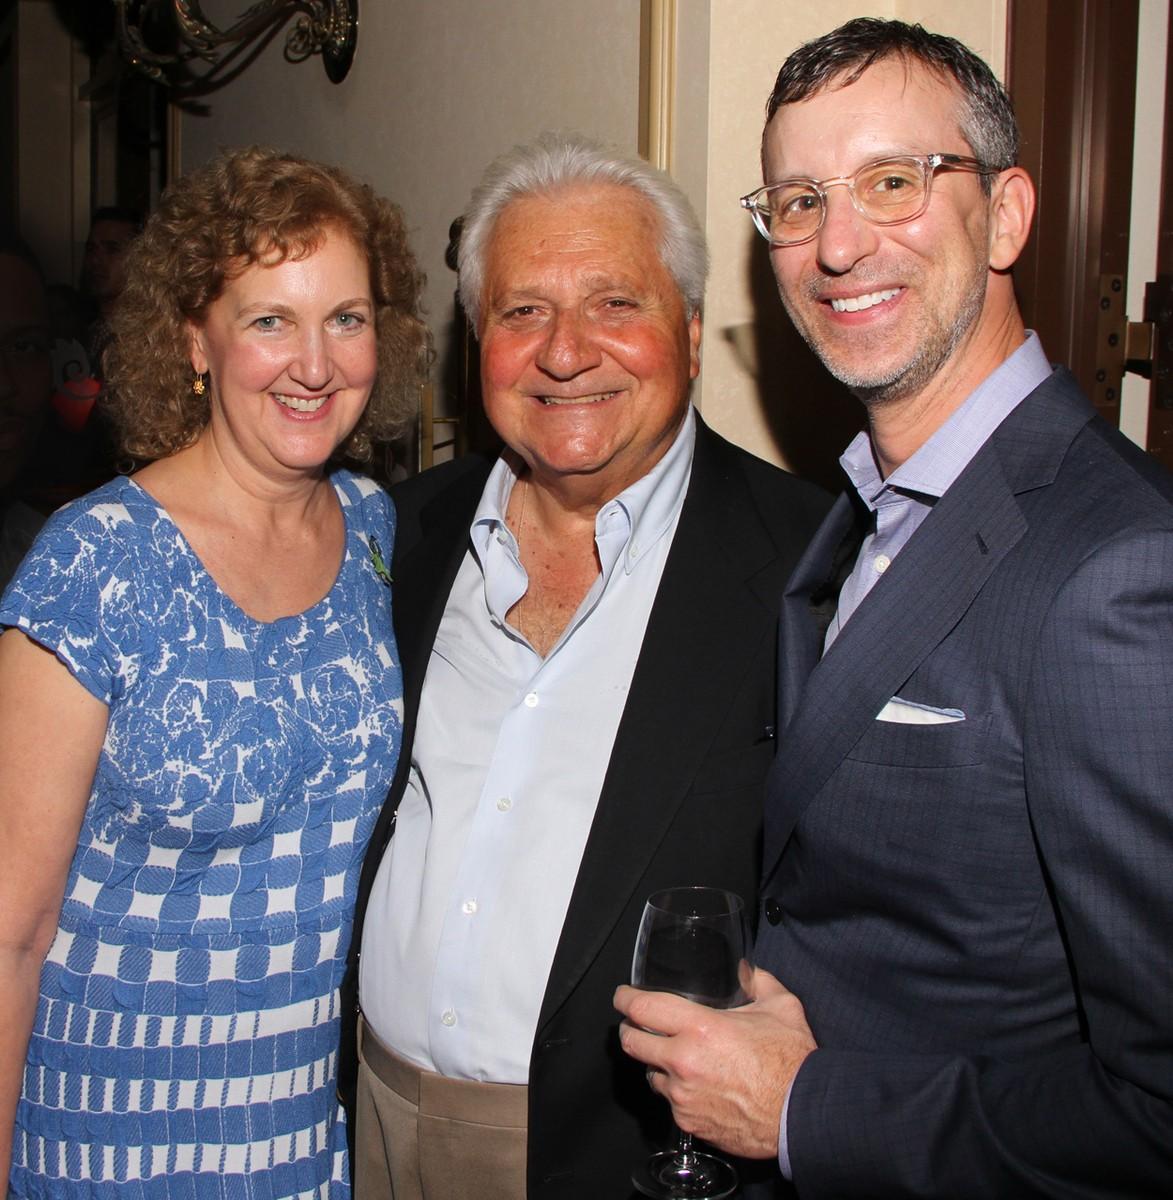 Julie Swidler, Martin Bandier & David Israelite at the Billboard Power 100 Party